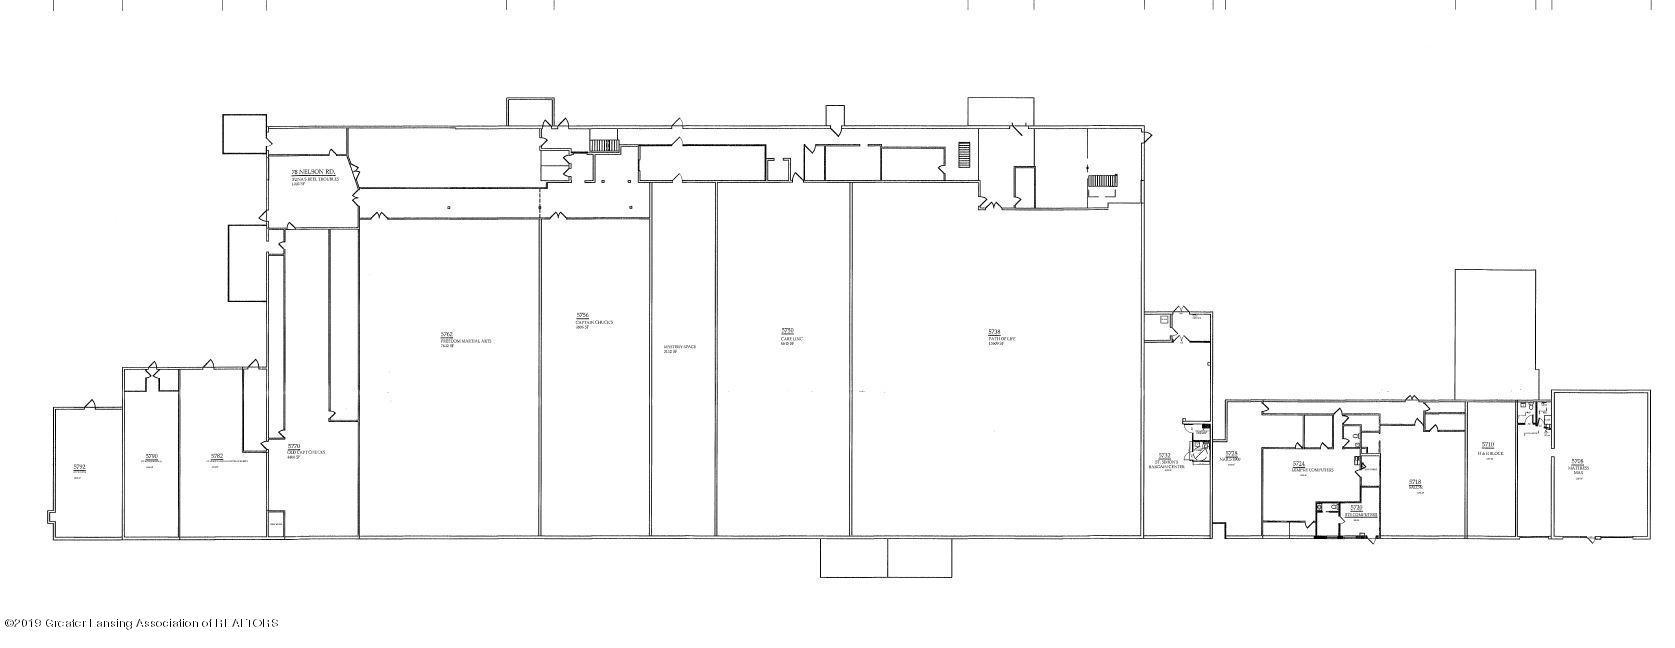 5750 US-10 - Site Plan - 6